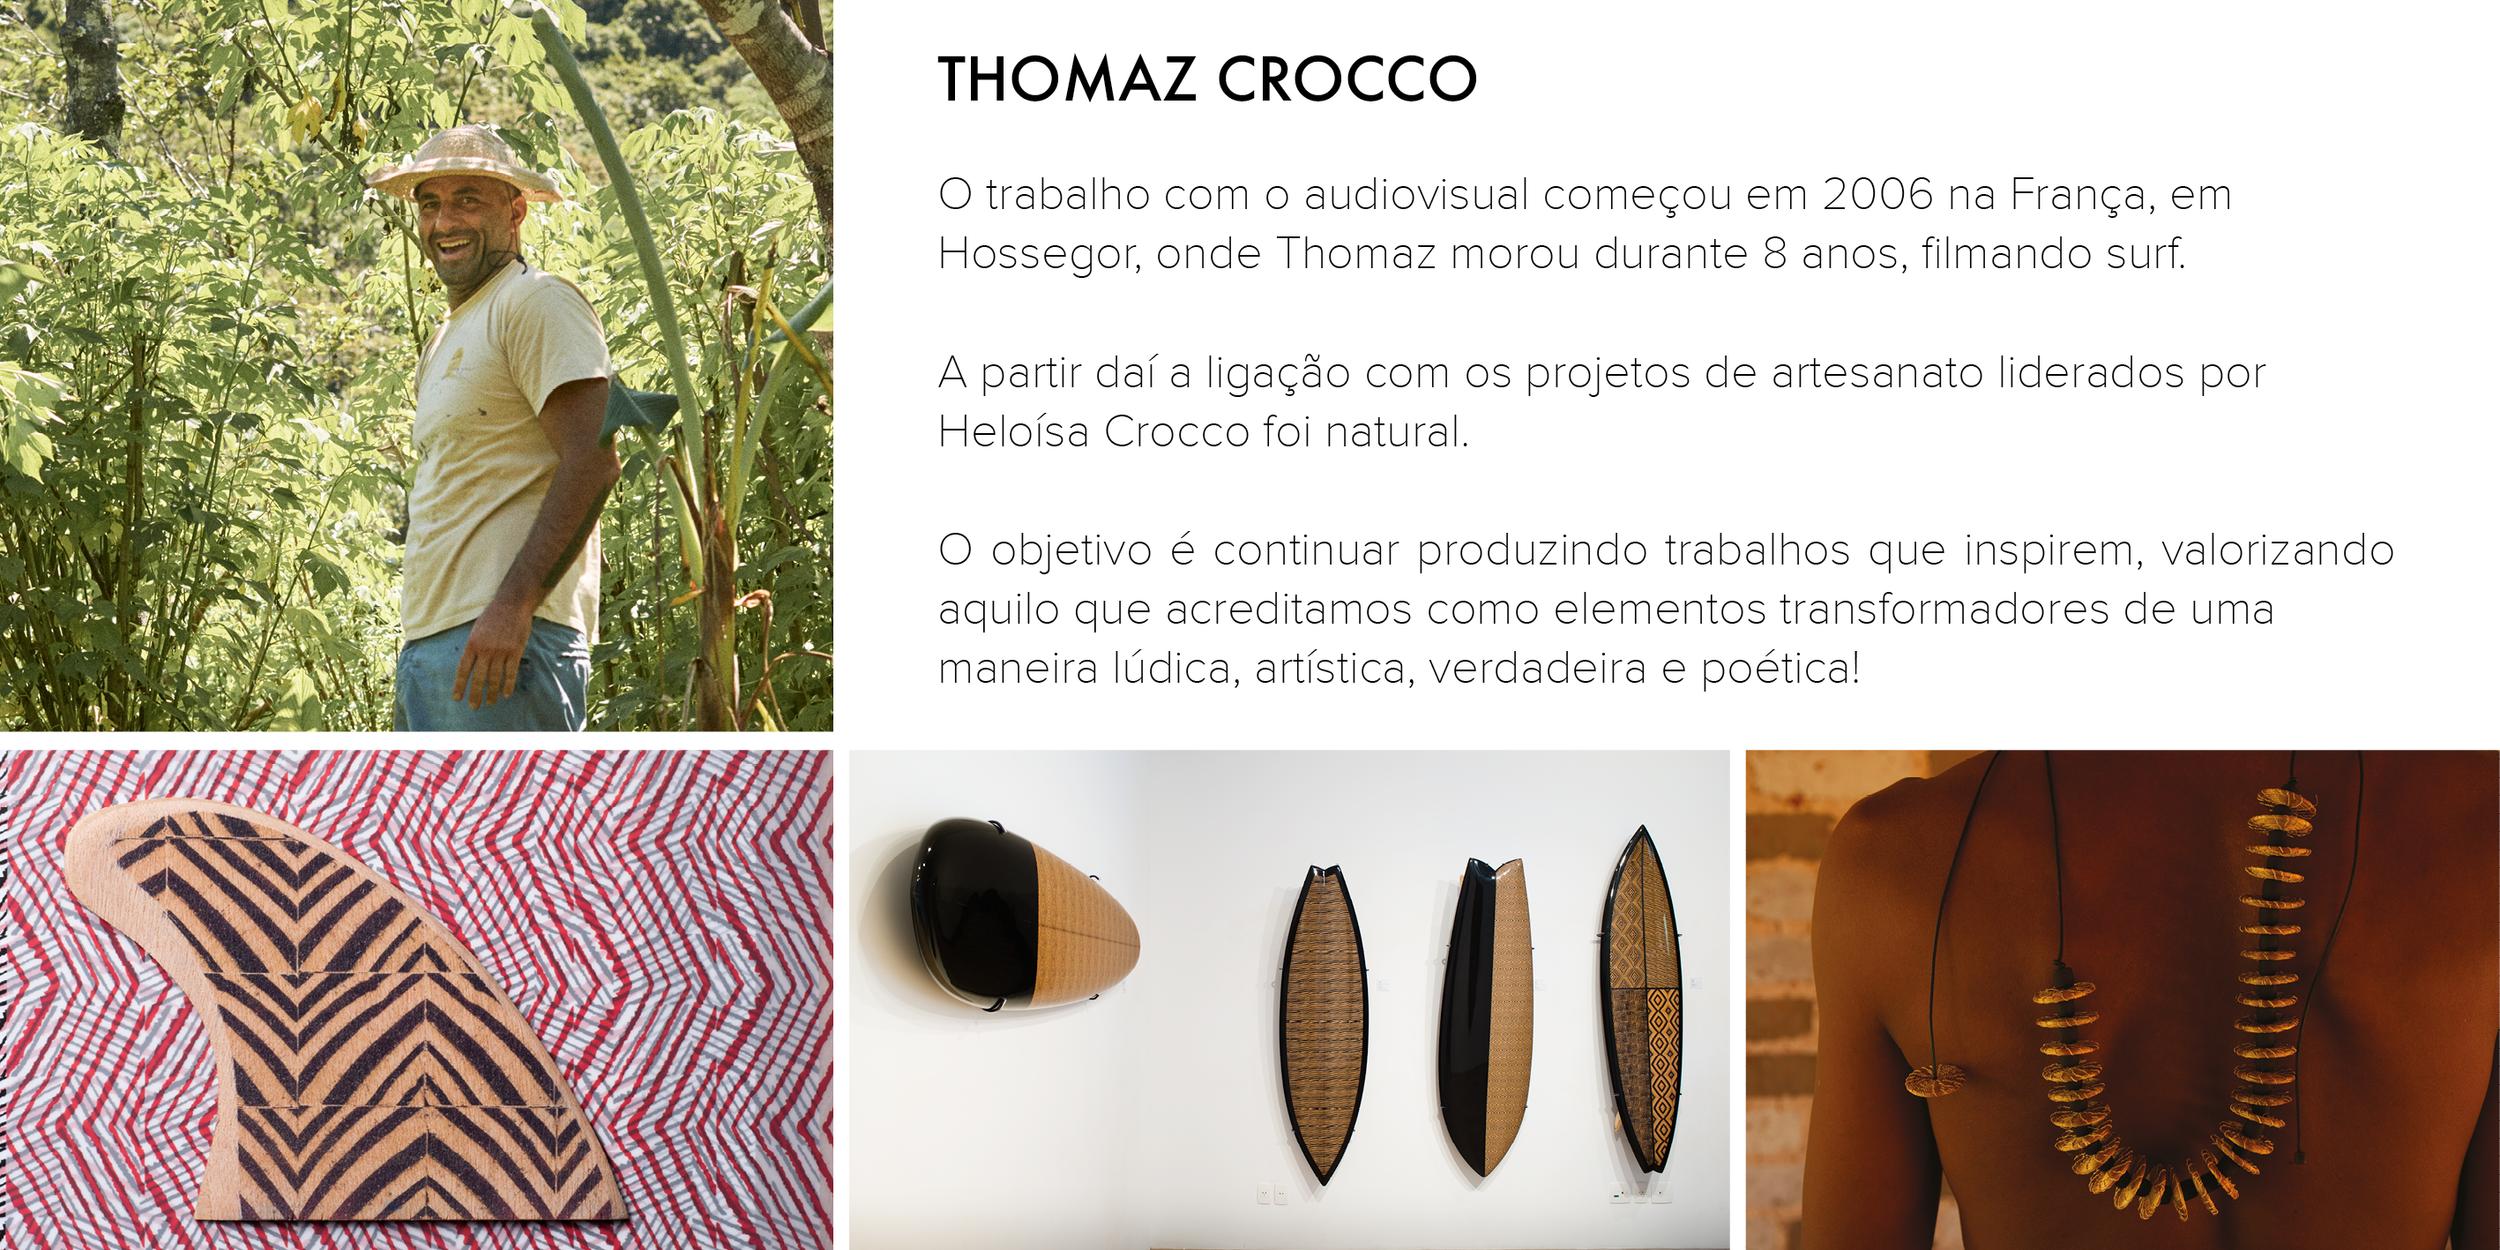 Thomaz Crocco Sobre.png